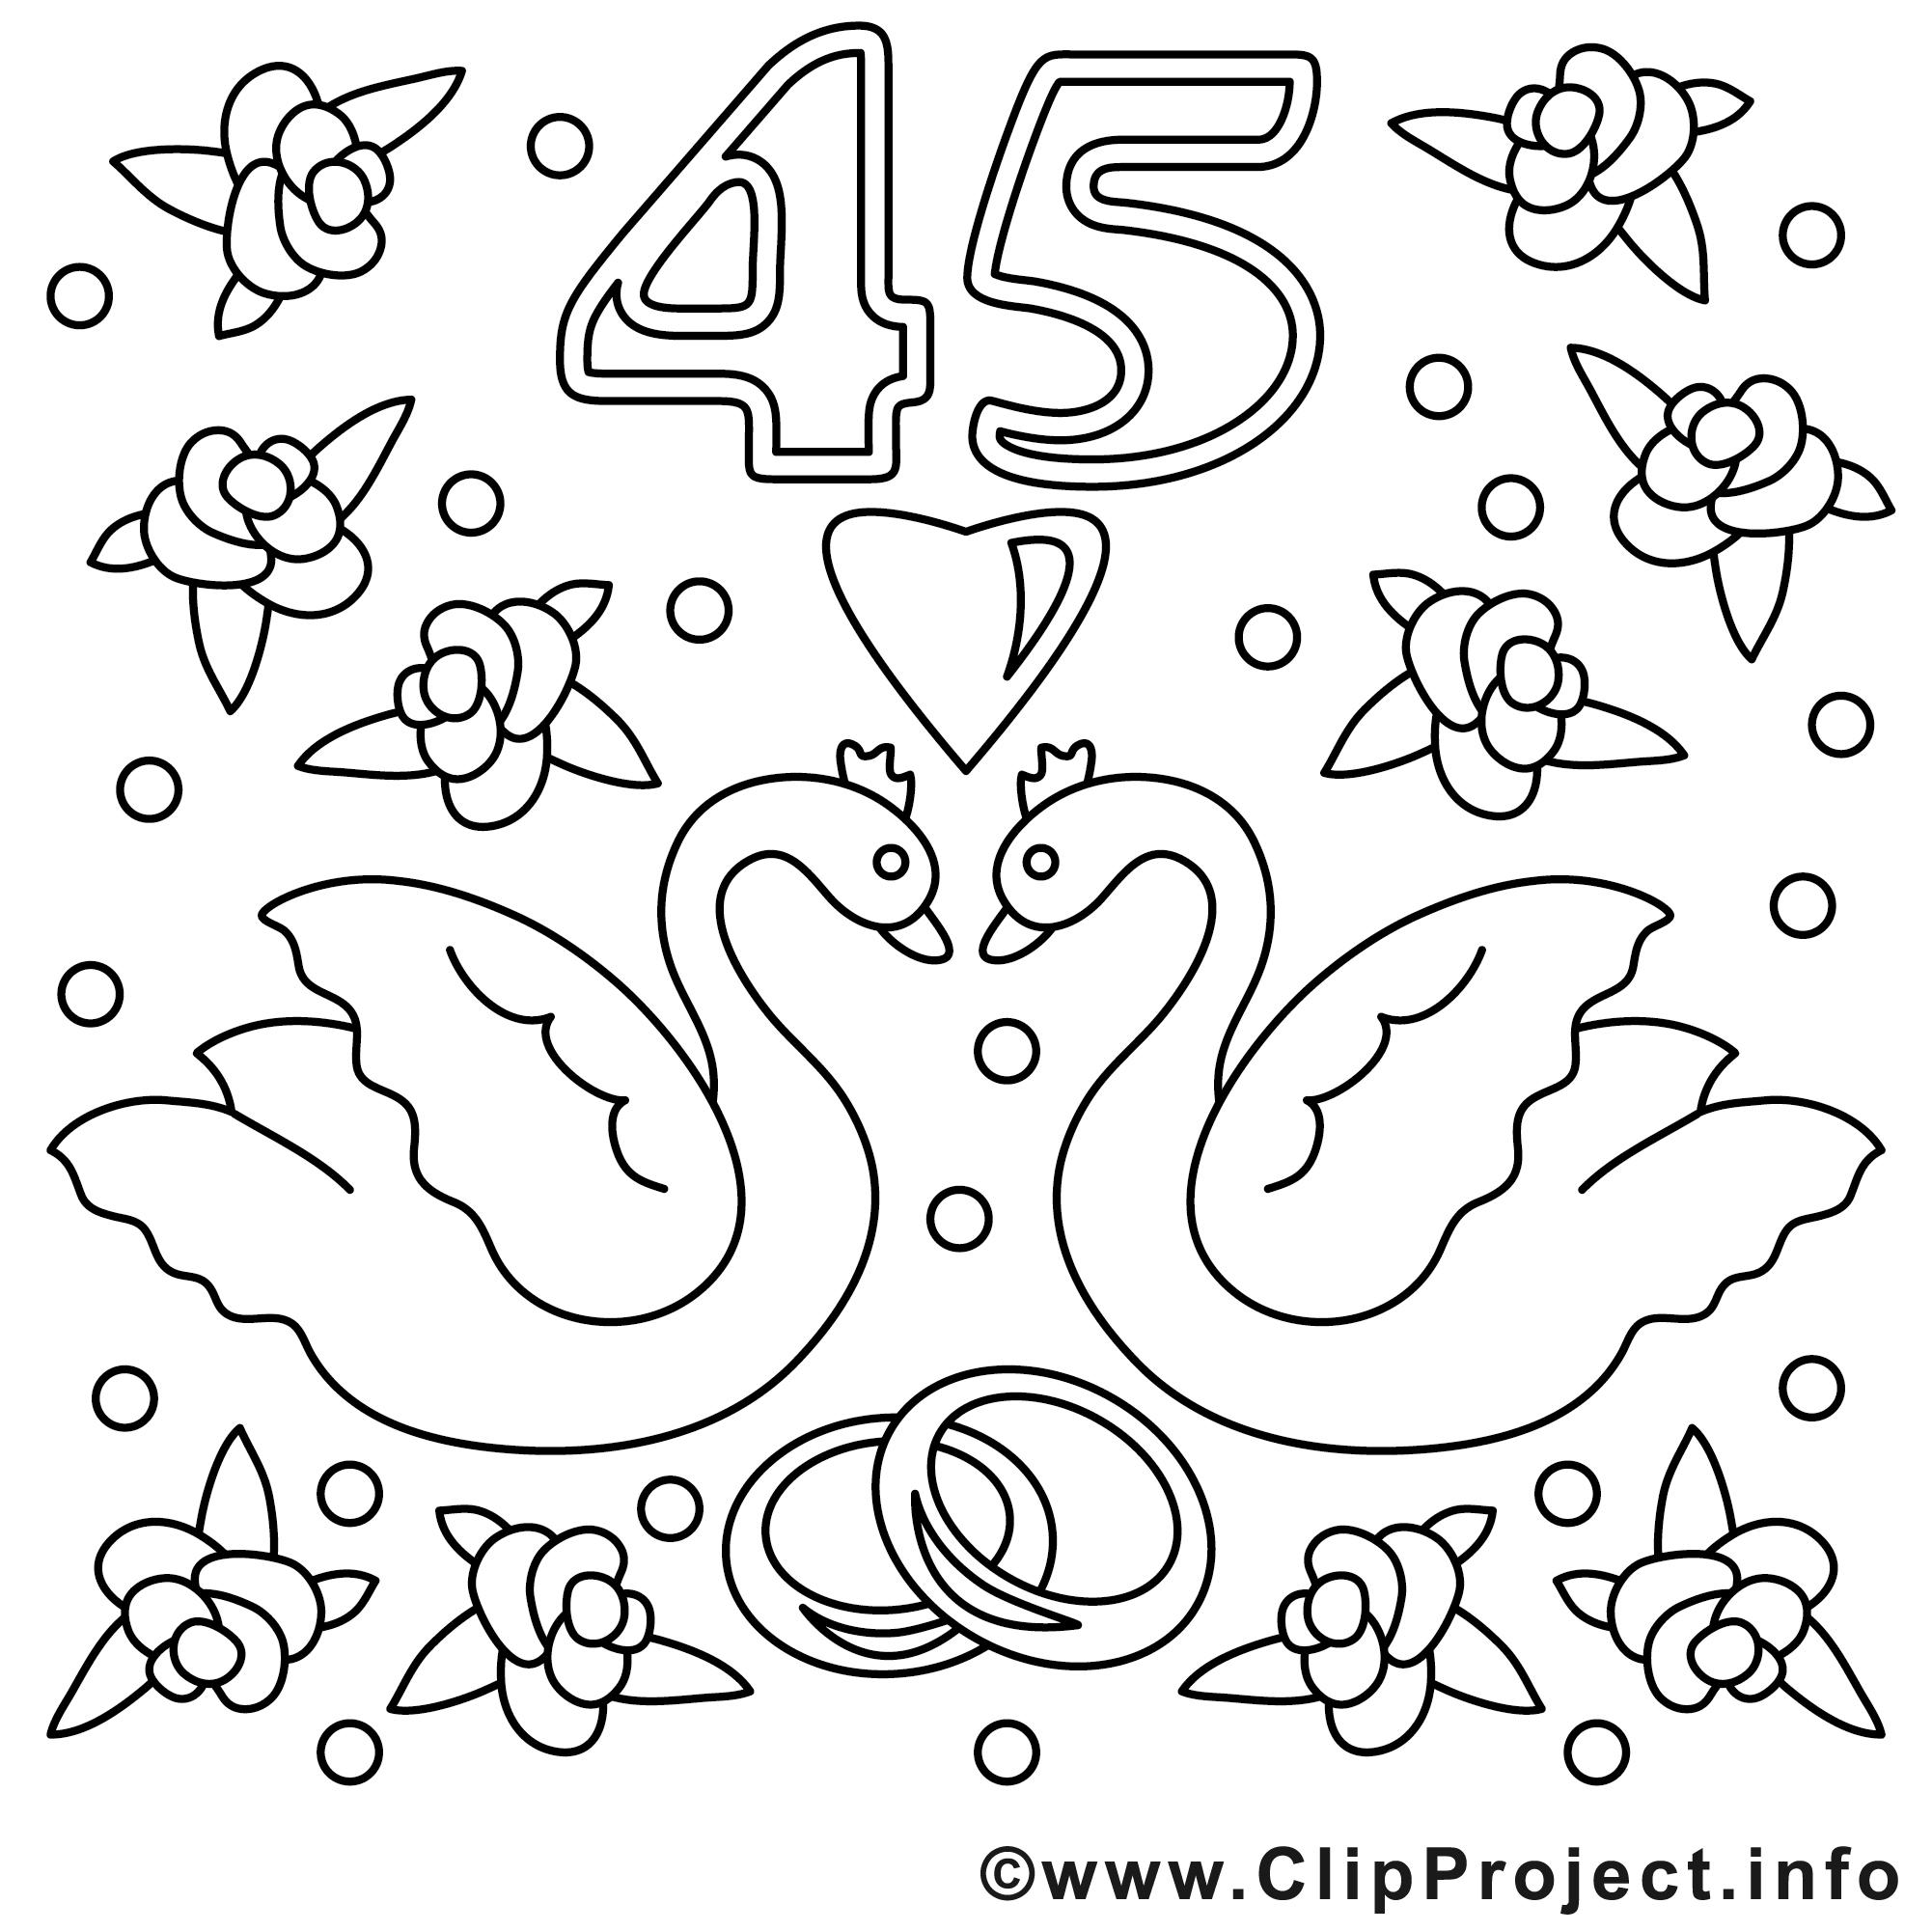 45 Ans Illustration Mariage A Colorier Mariage Coloriages Dessin